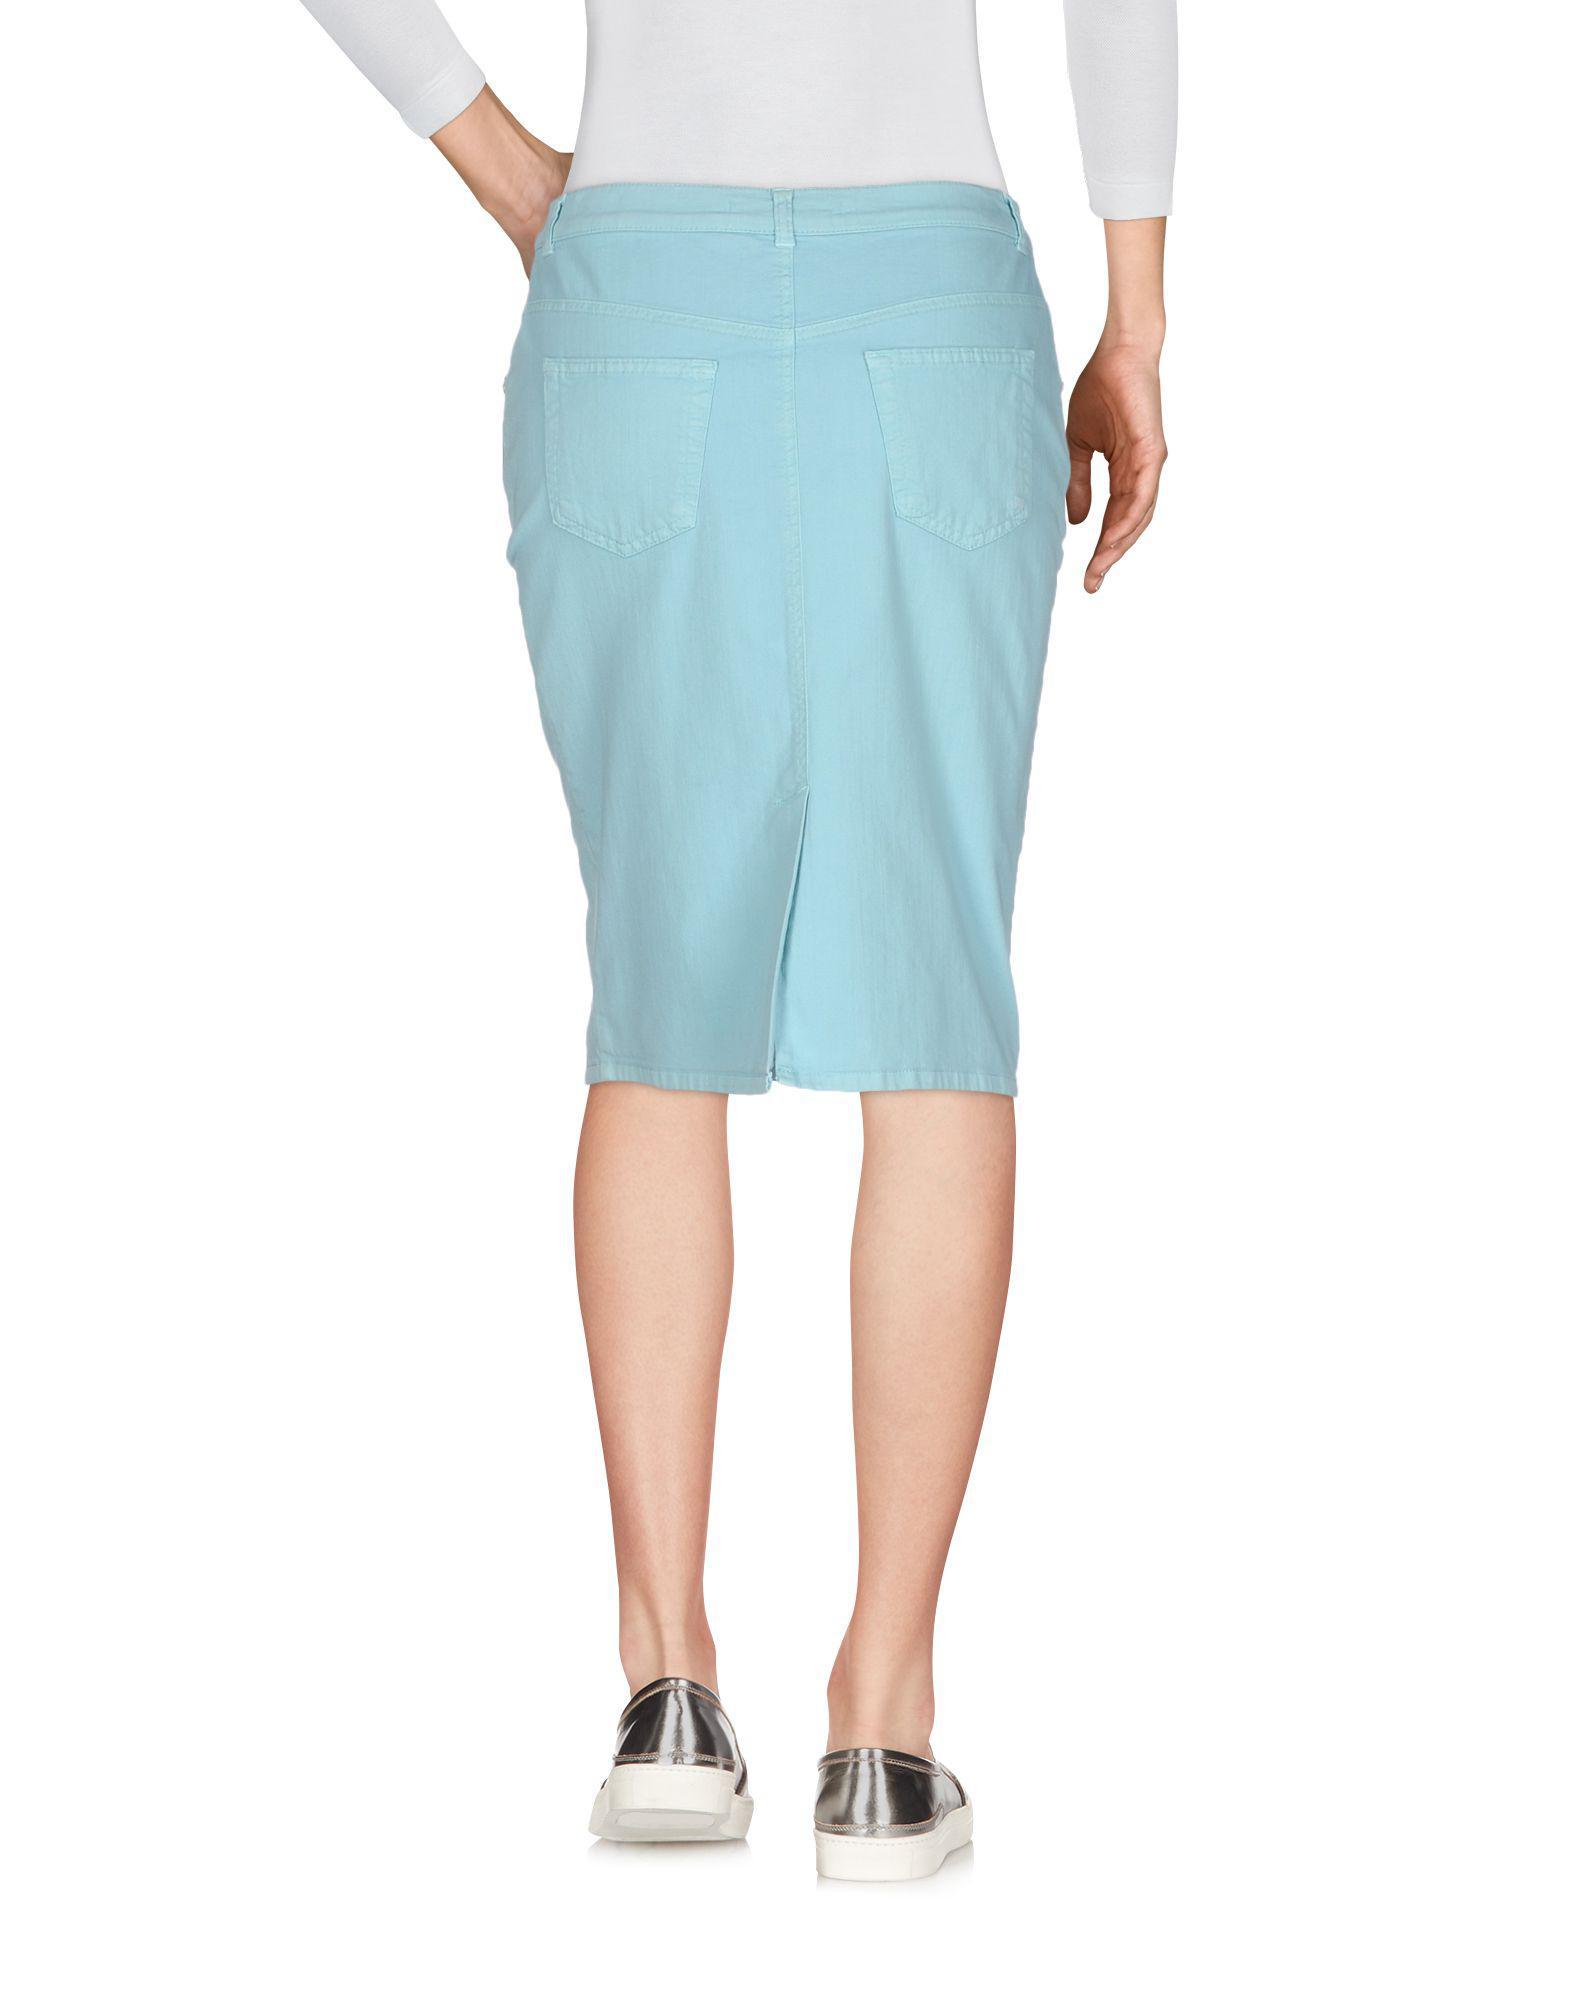 Buy Cheap Brand New Unisex DENIM - Denim skirts Martinelli Cheap 2018 Unisex High Quality Online Discount Finishline Really M9Hb3pw